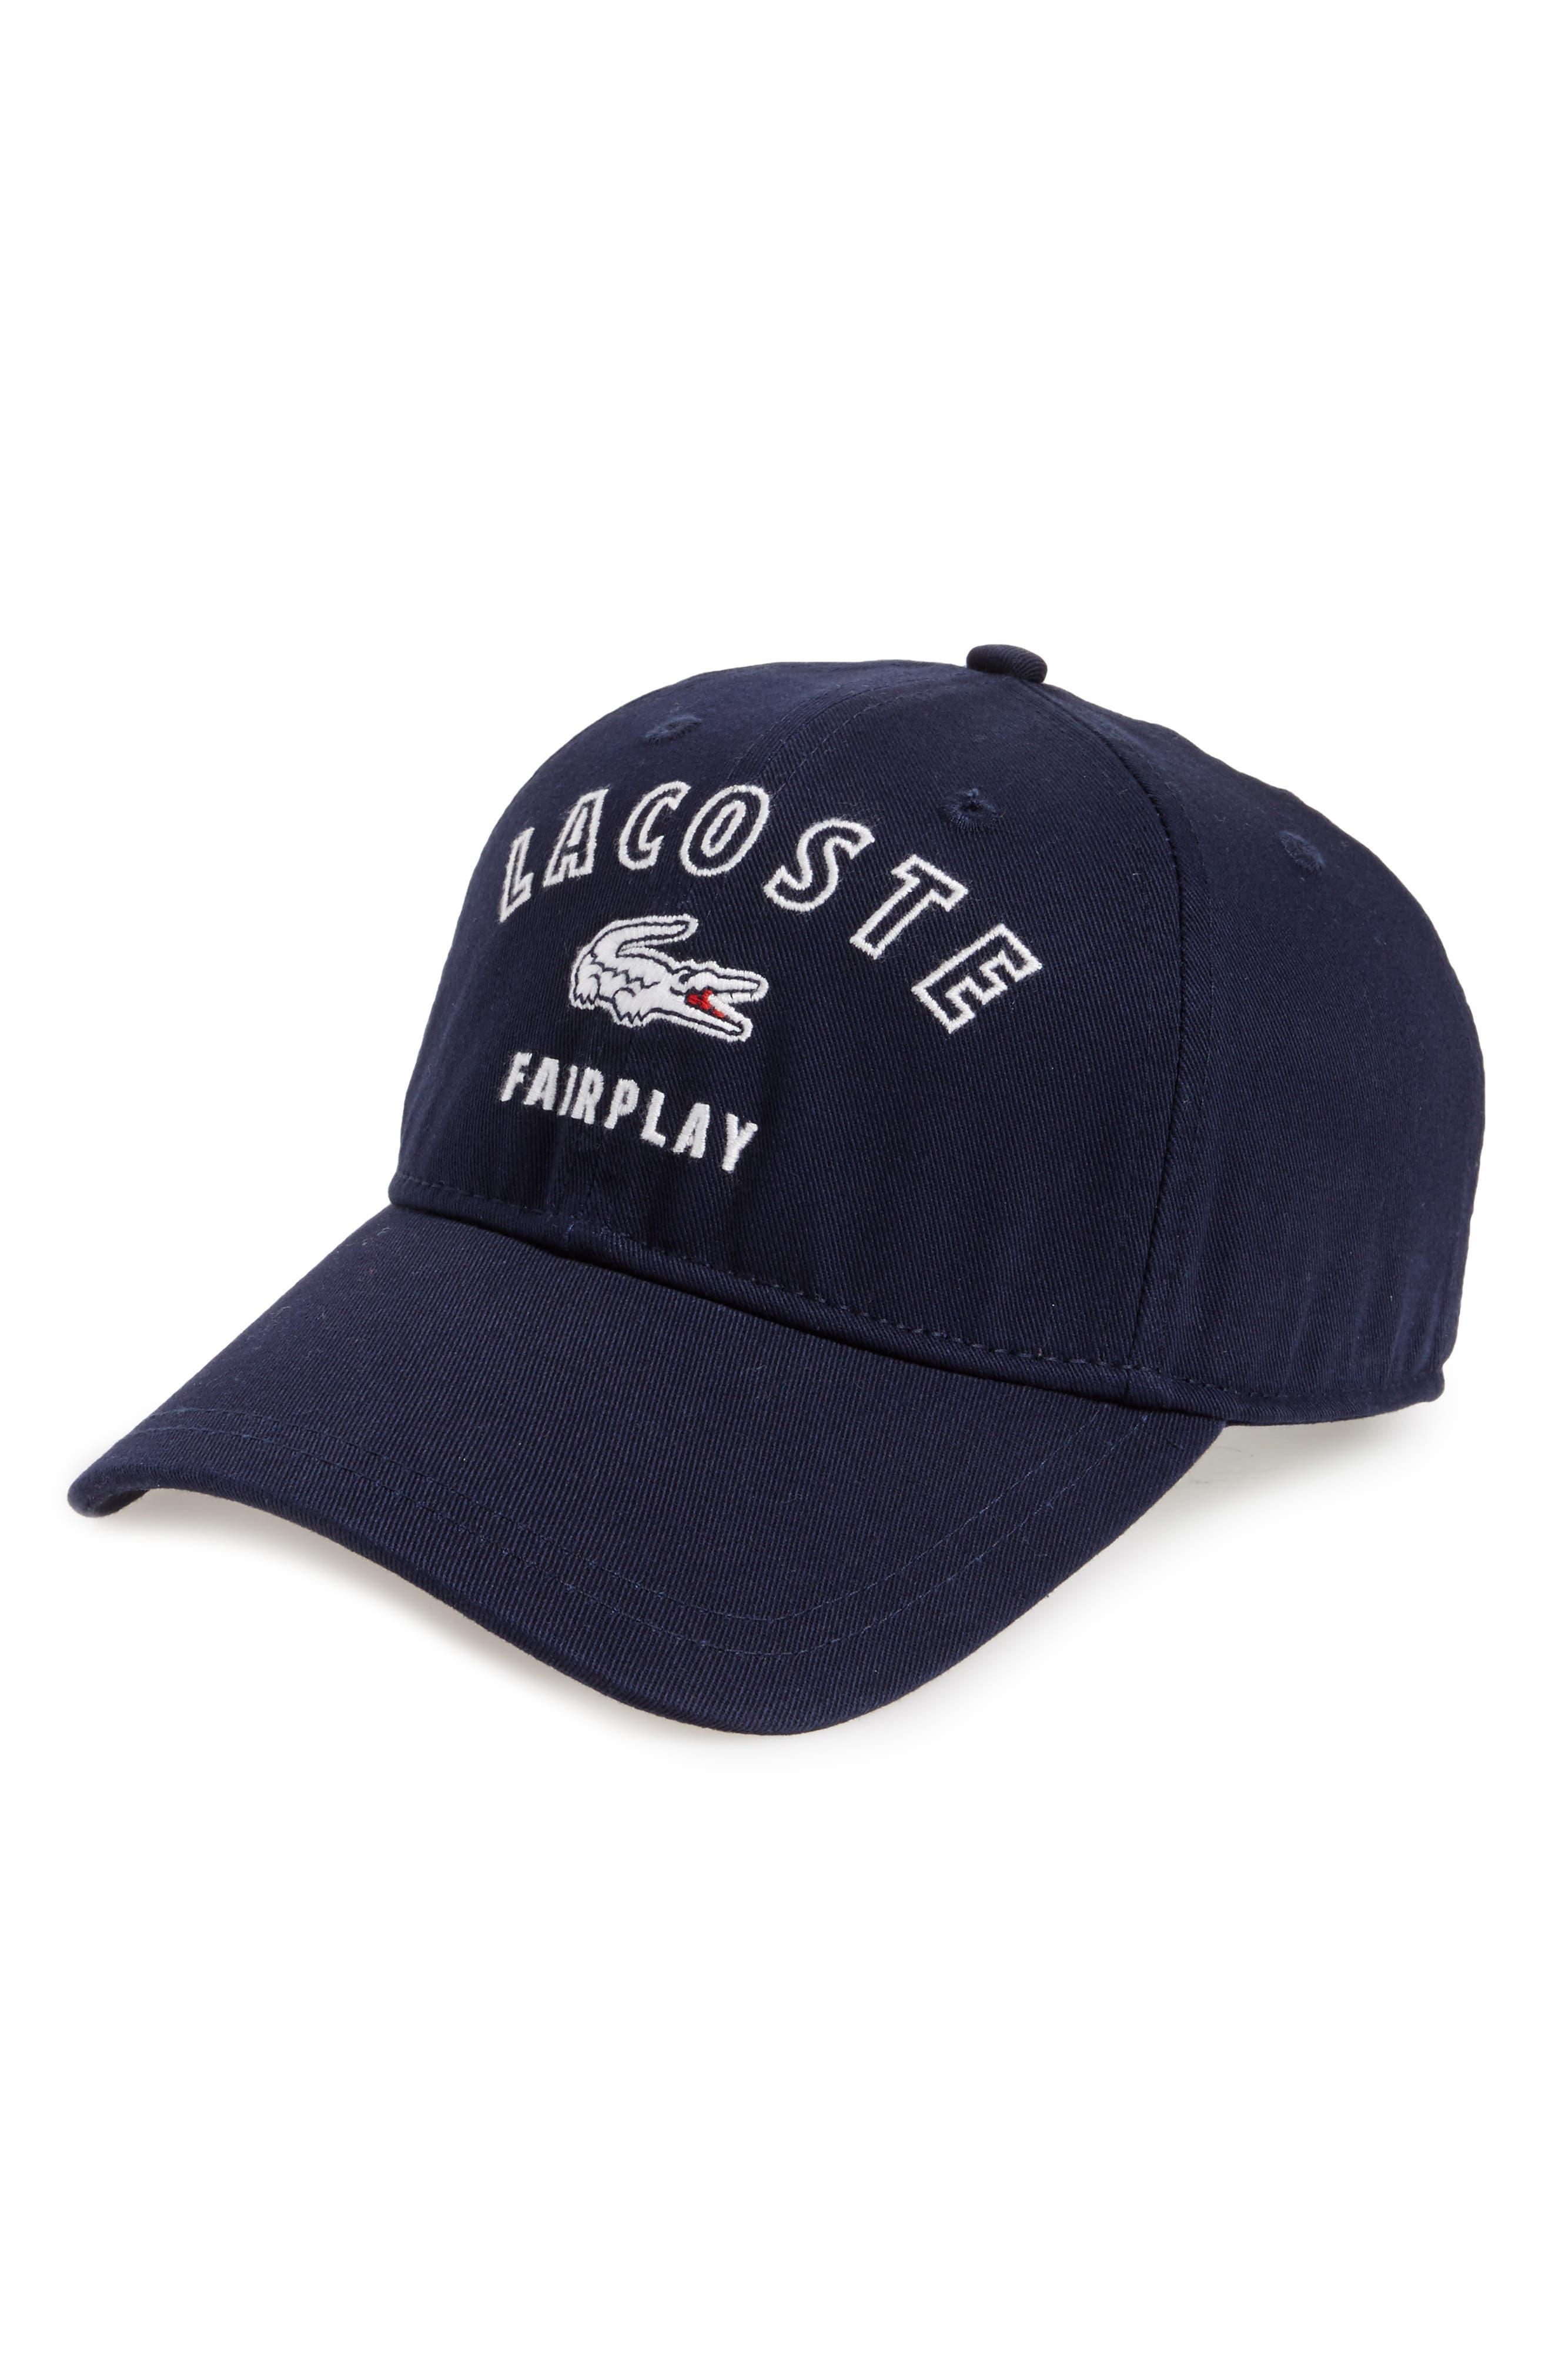 Alternate Image 1 Selected - Lacoste Fairplay Gabardine Ball Cap